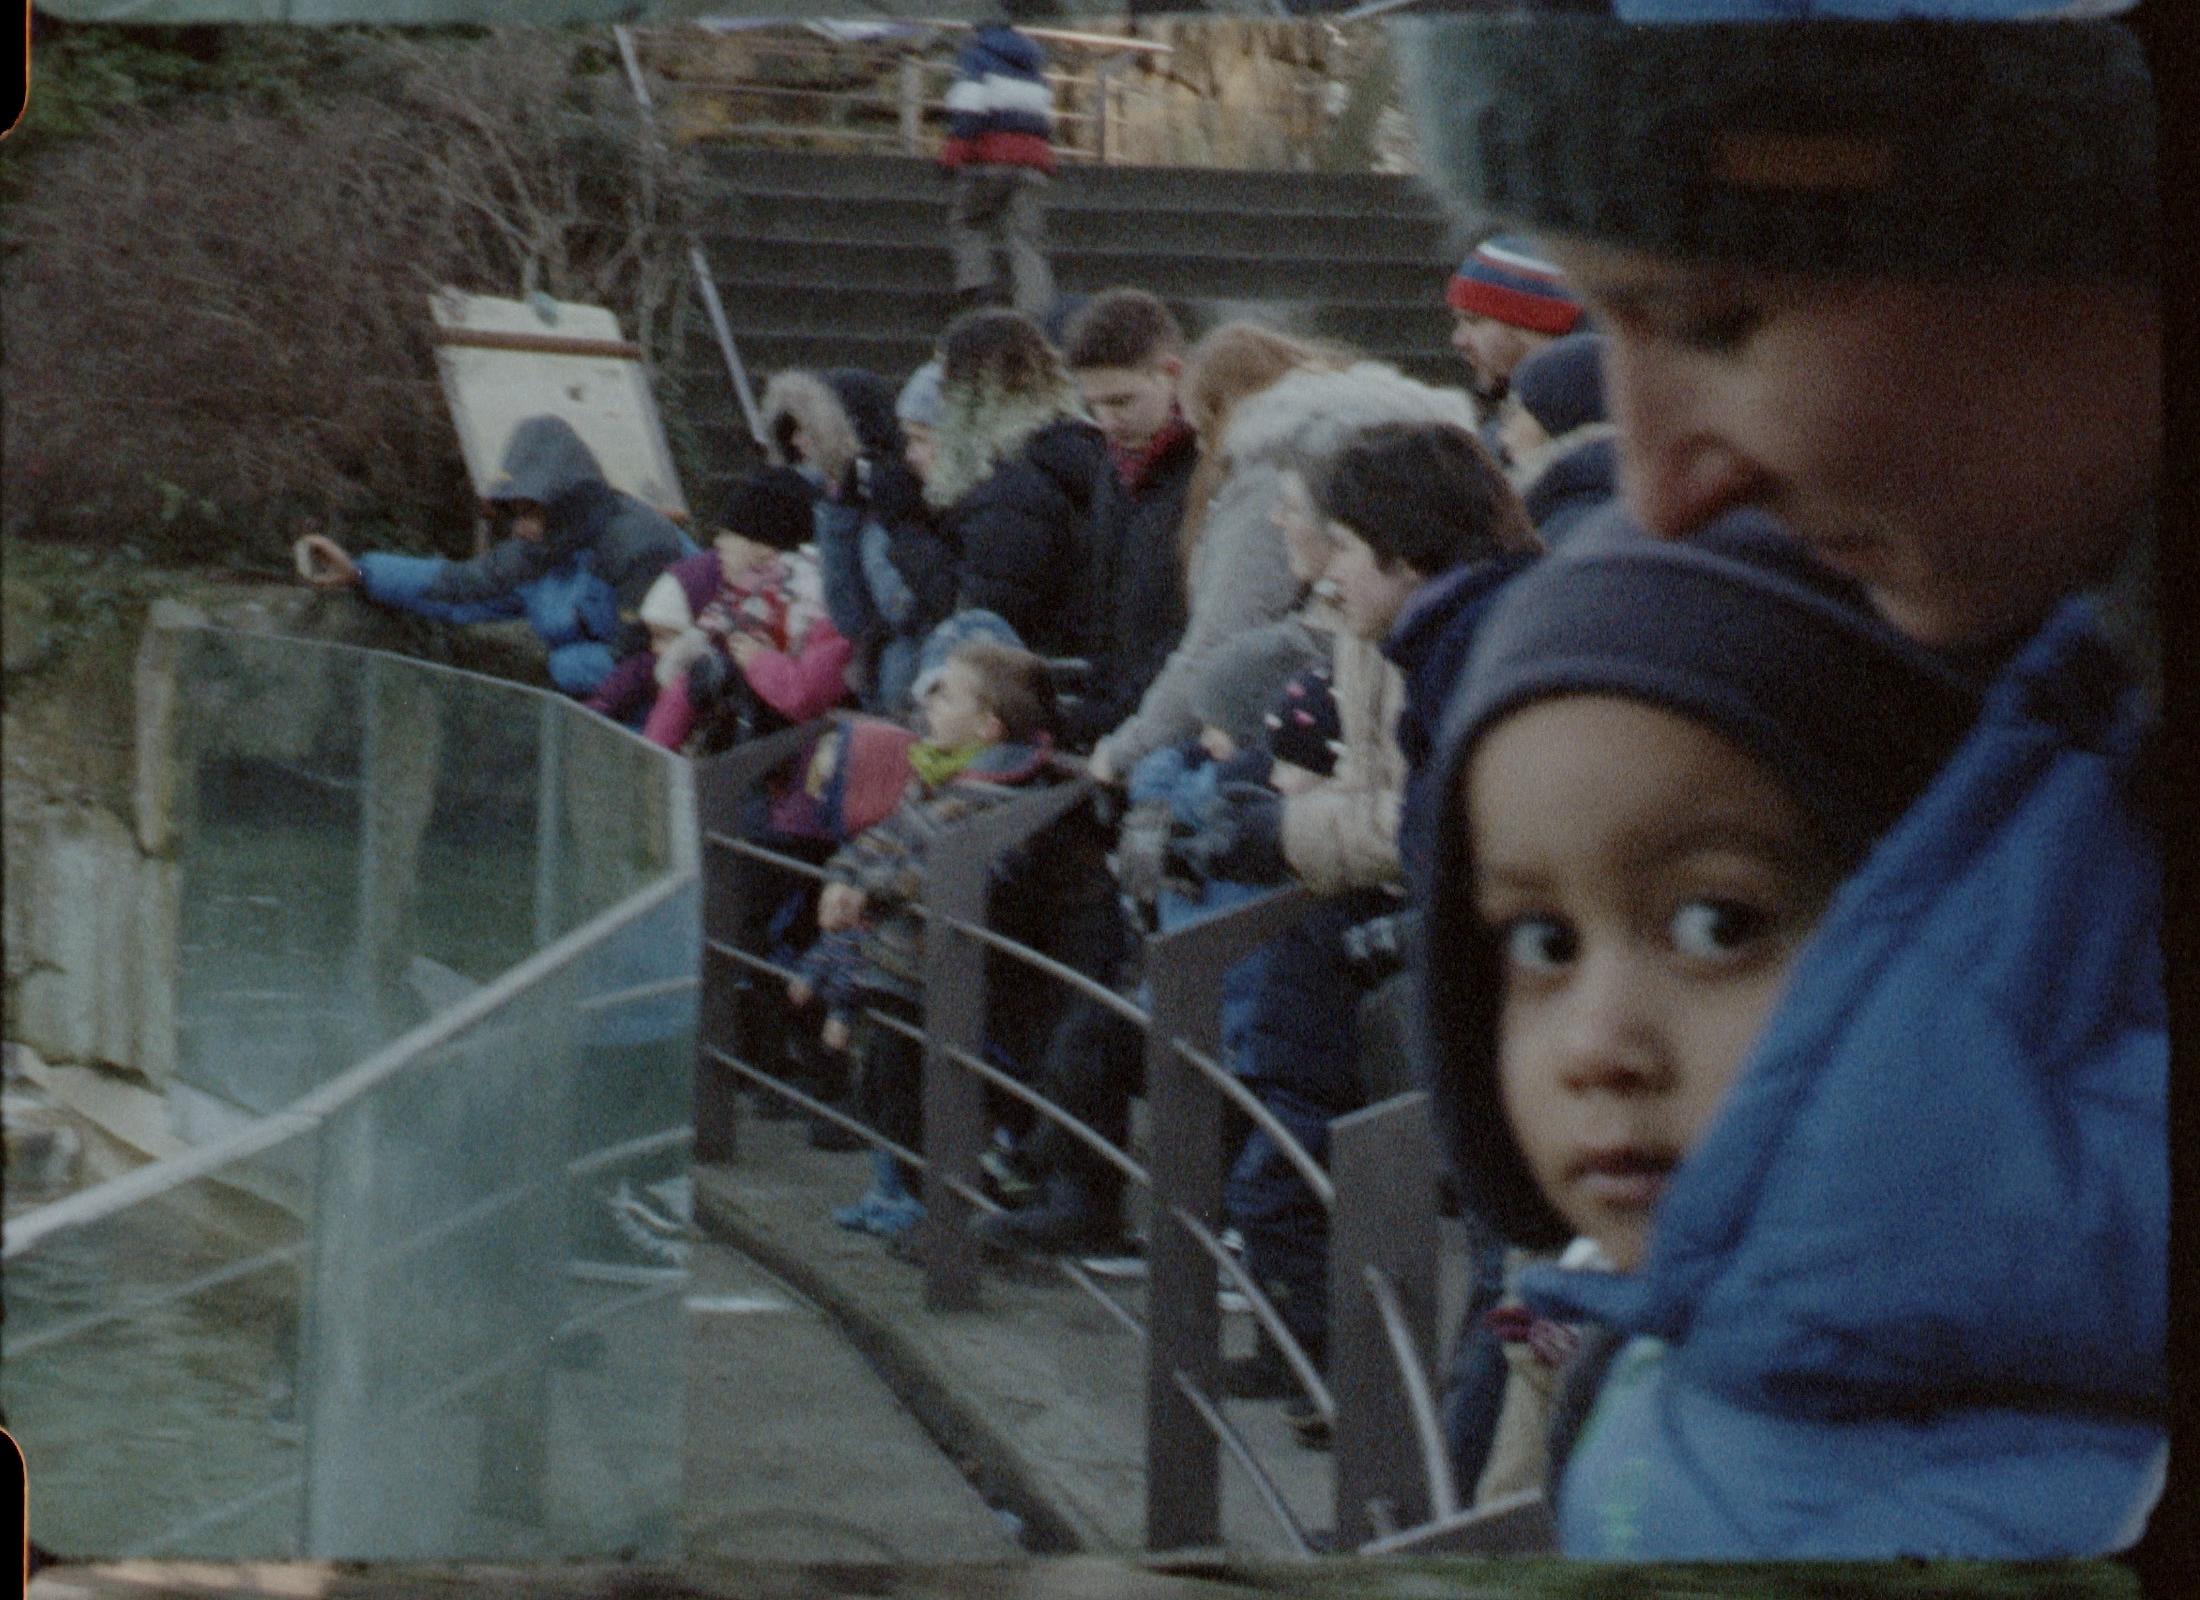 TF kid at zoo3 fullfr.jpg